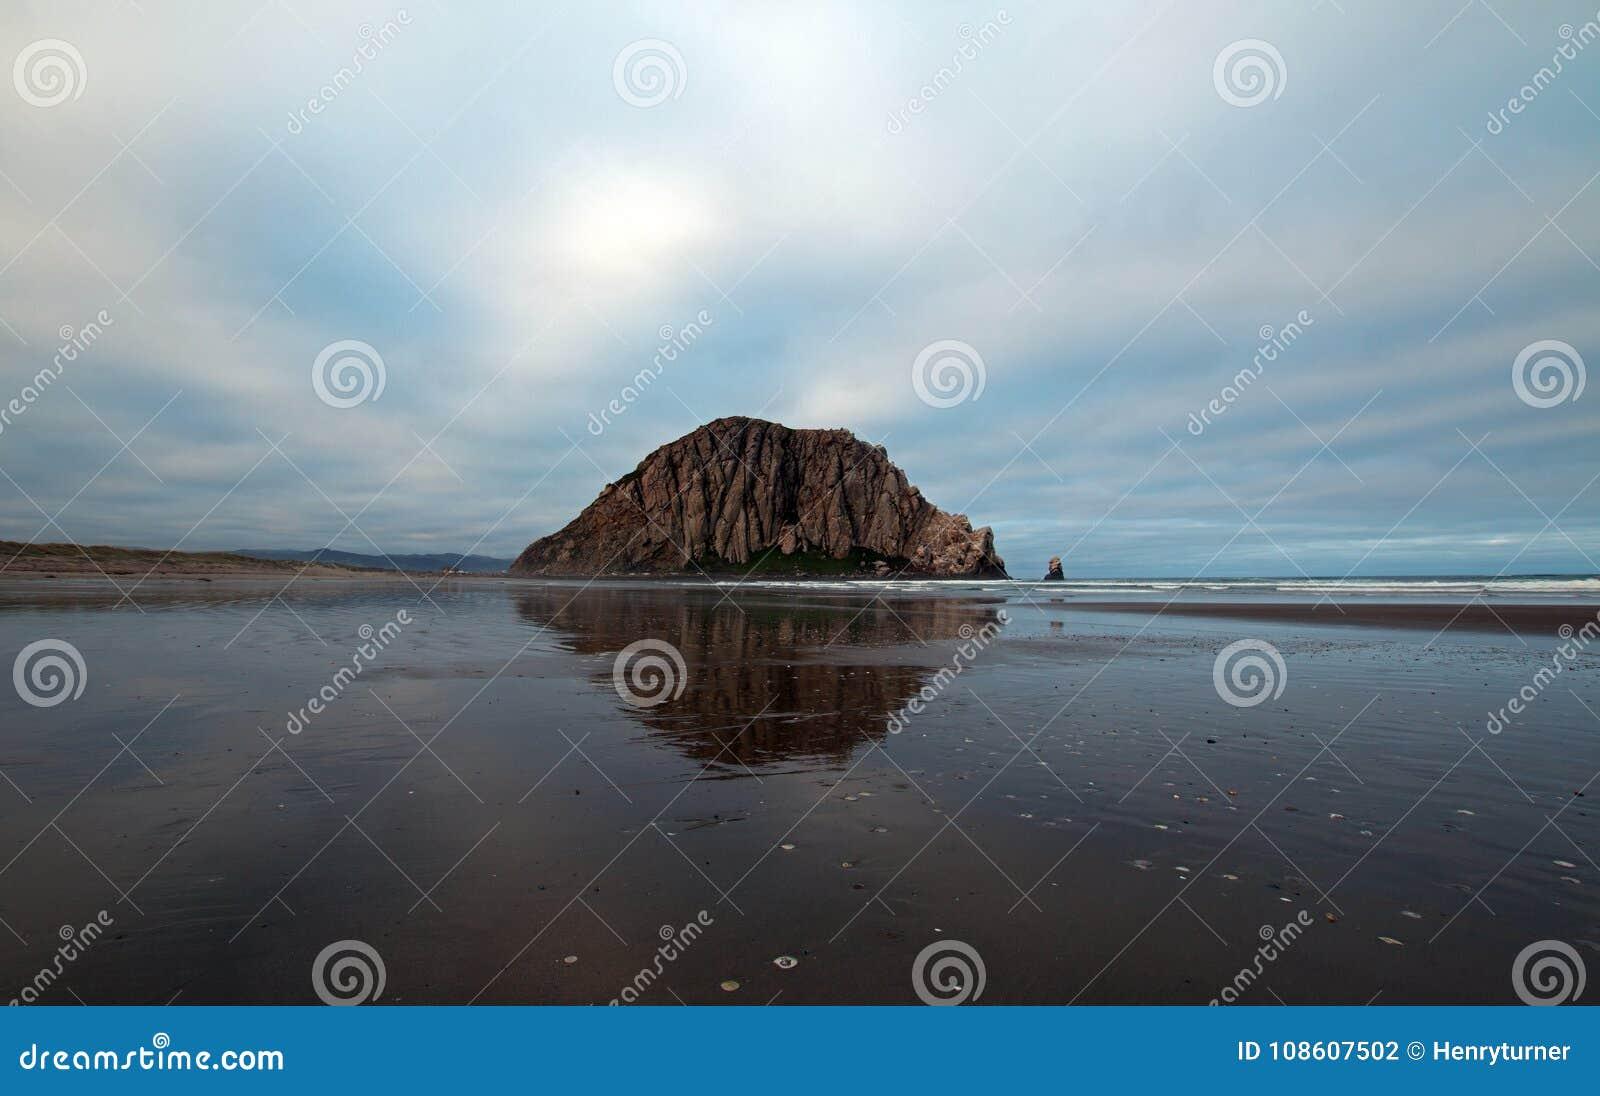 Morro岩石在莫罗贝国家公园的清早中央加利福尼亚海岸的美国